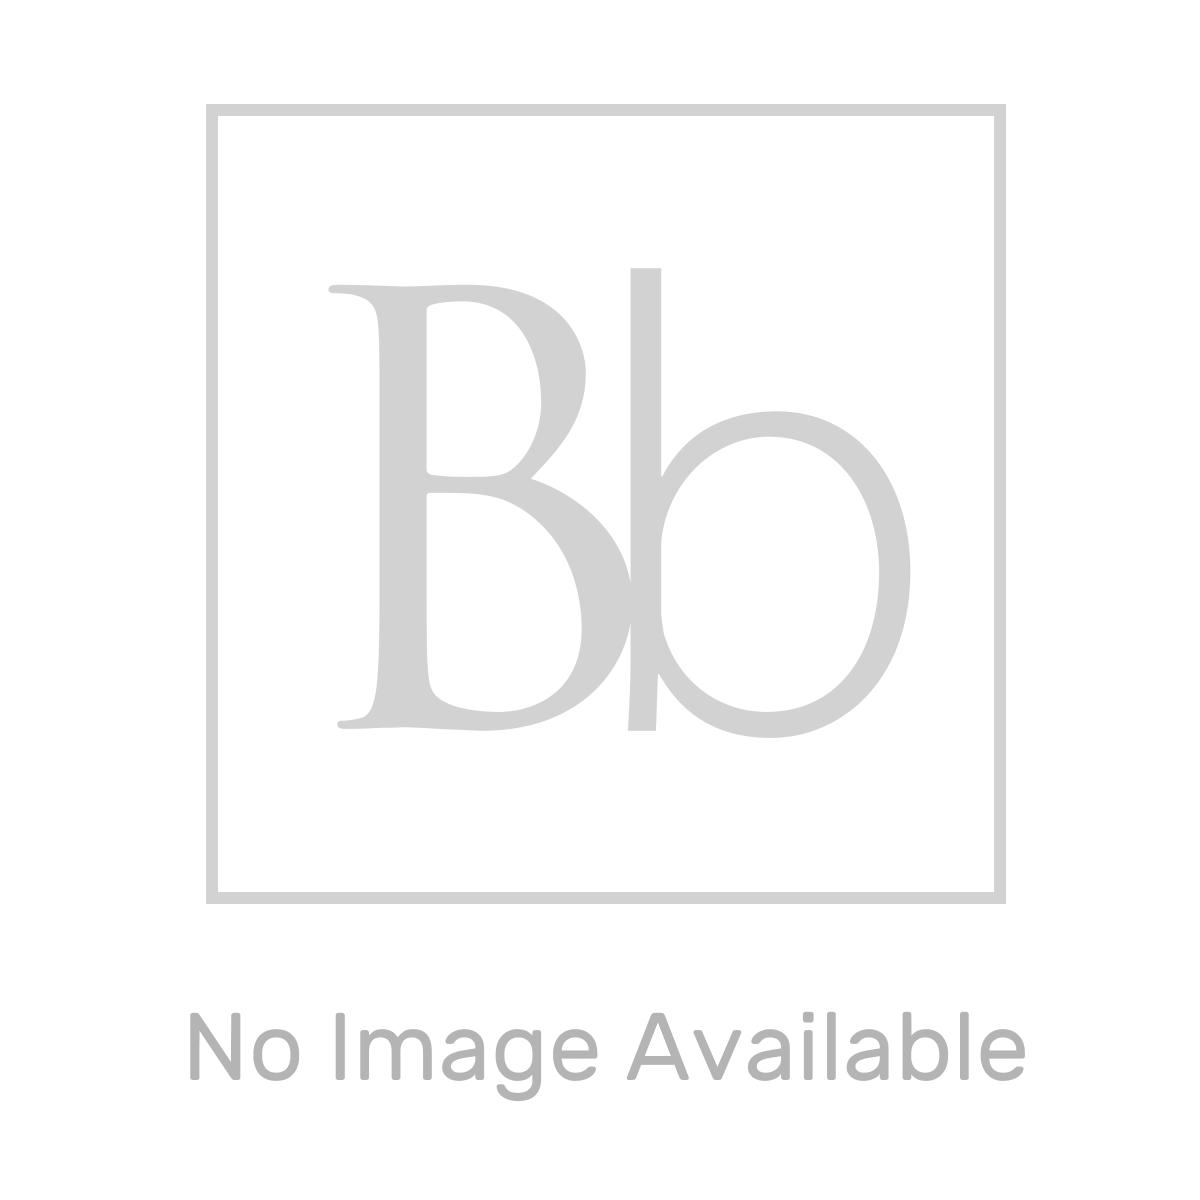 RAK Shino Gloss White Urinal Measurements